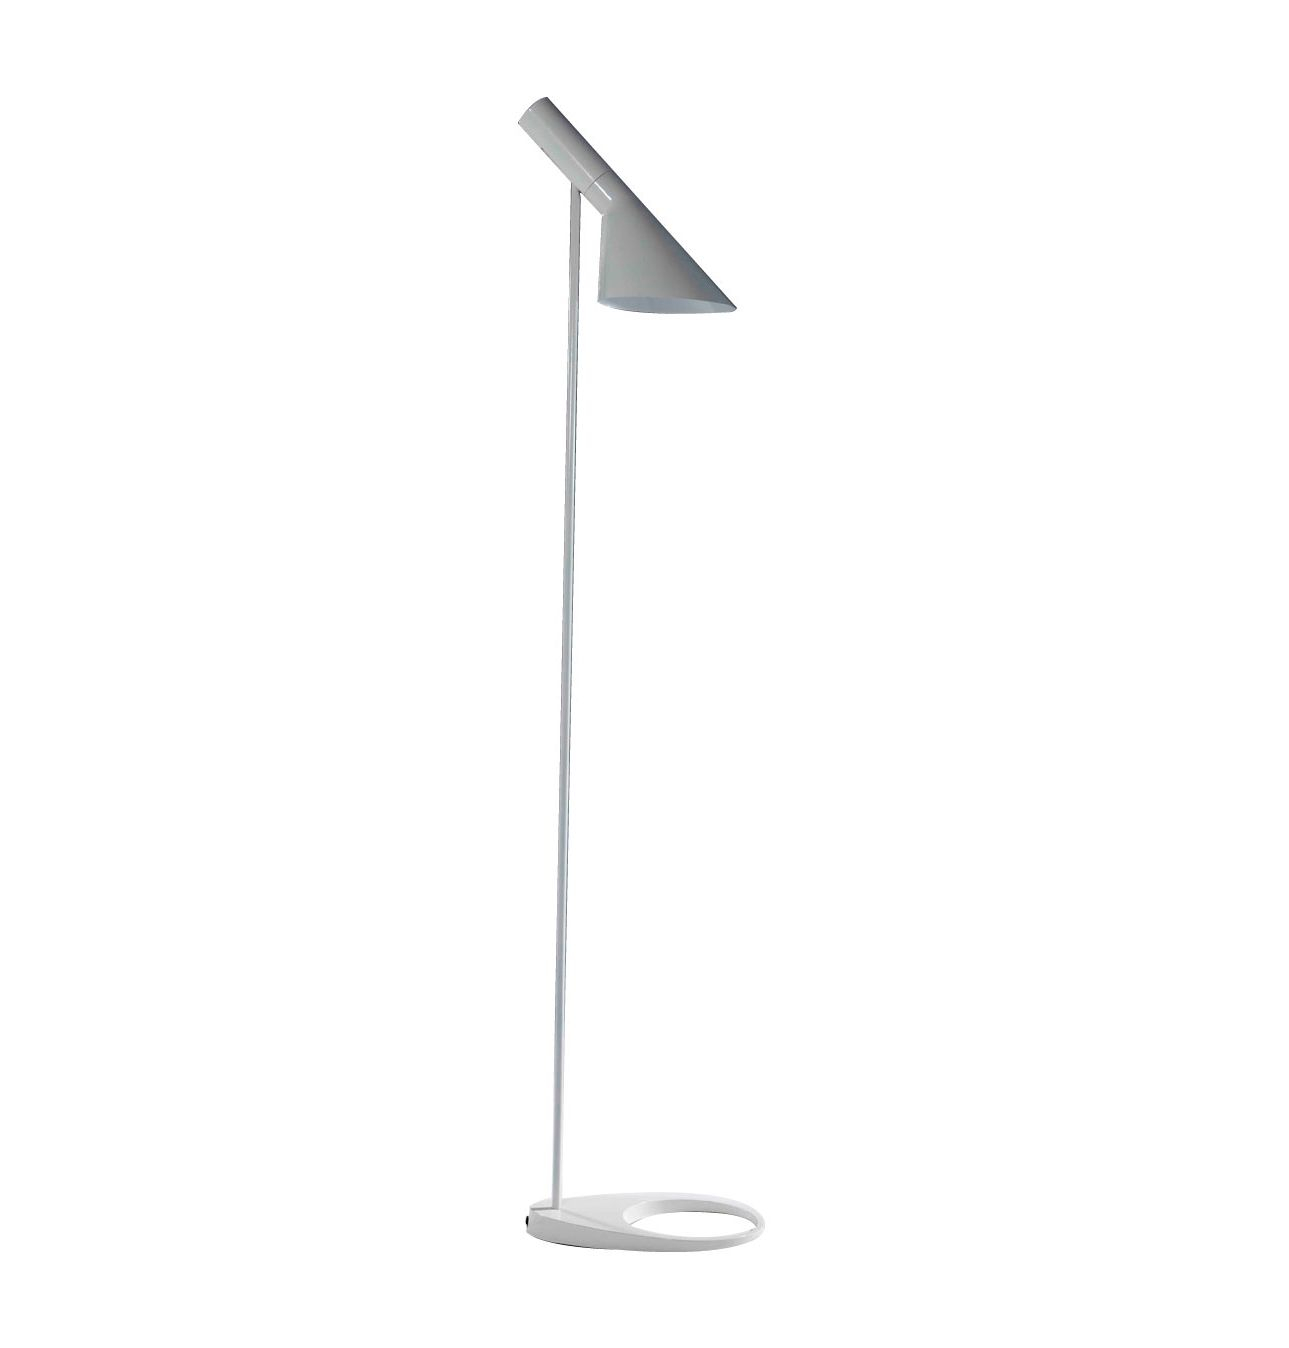 Replica Aj Floor Lamp Arne Jacobsen Matt Blatt 248 throughout measurements 1289 X 1348